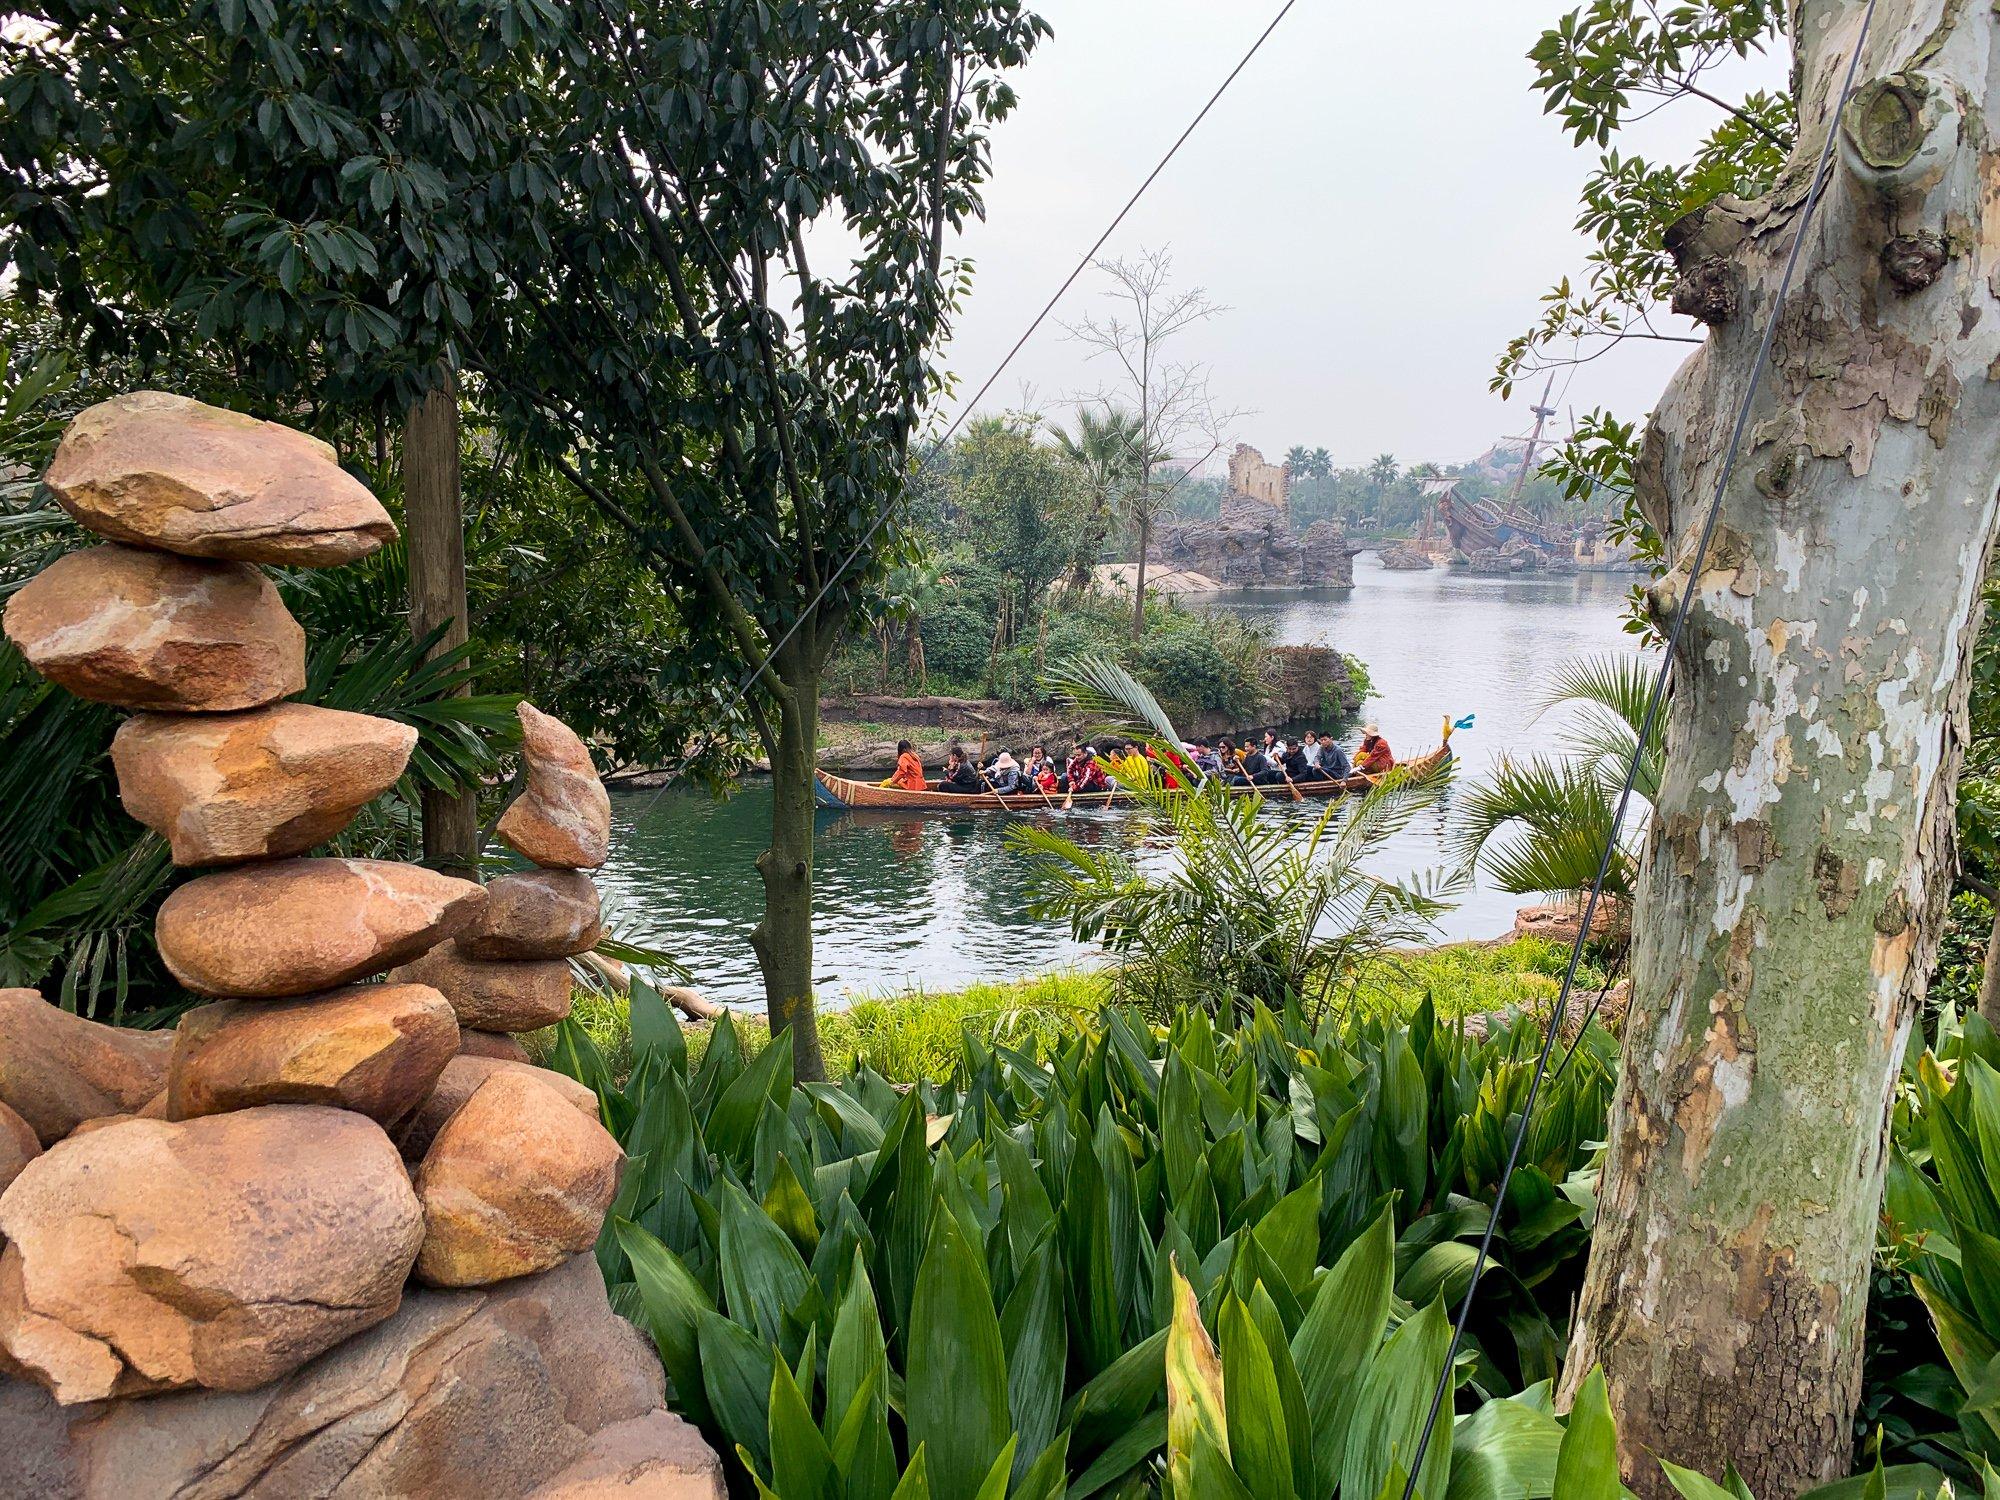 People-powered Explorer Canoes at Shanghai Disneyland